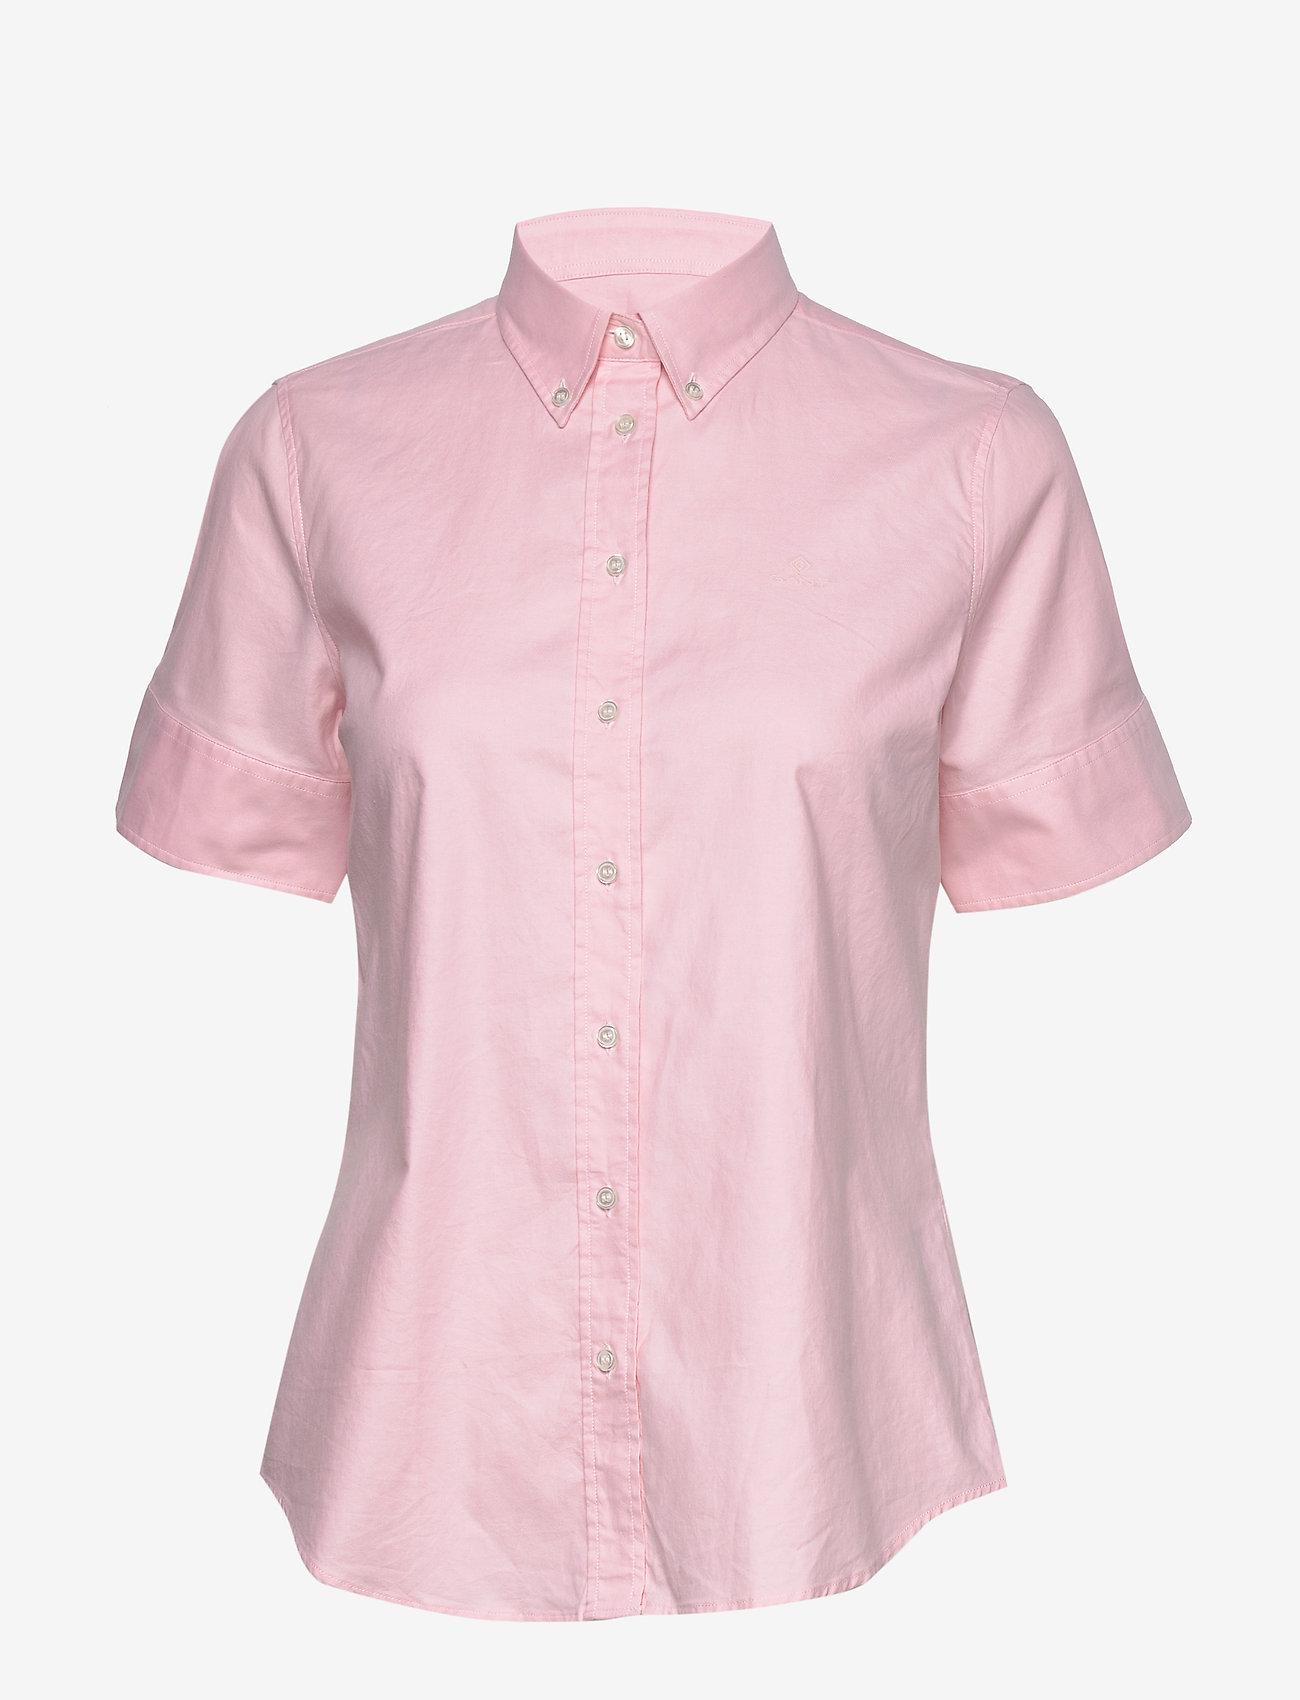 GANT - STRETCH OXFORD SOLID SS SHIRT - overhemden met korte mouwen - light pink - 0